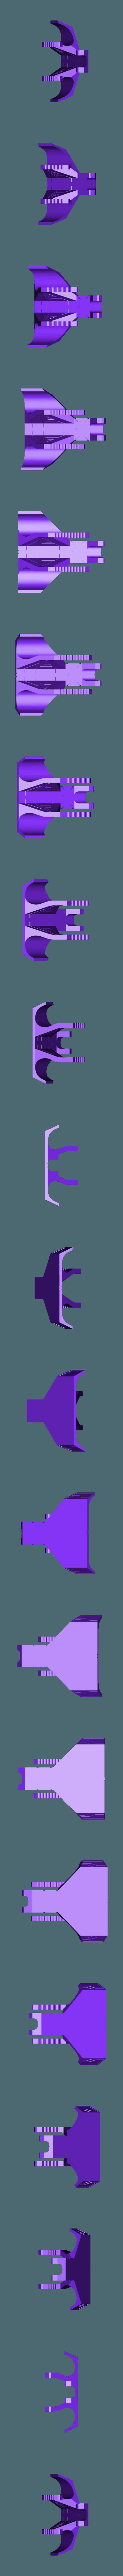 Catapult Body.stl Download free STL file Catapult Defense • 3D print model, FerryTeacher